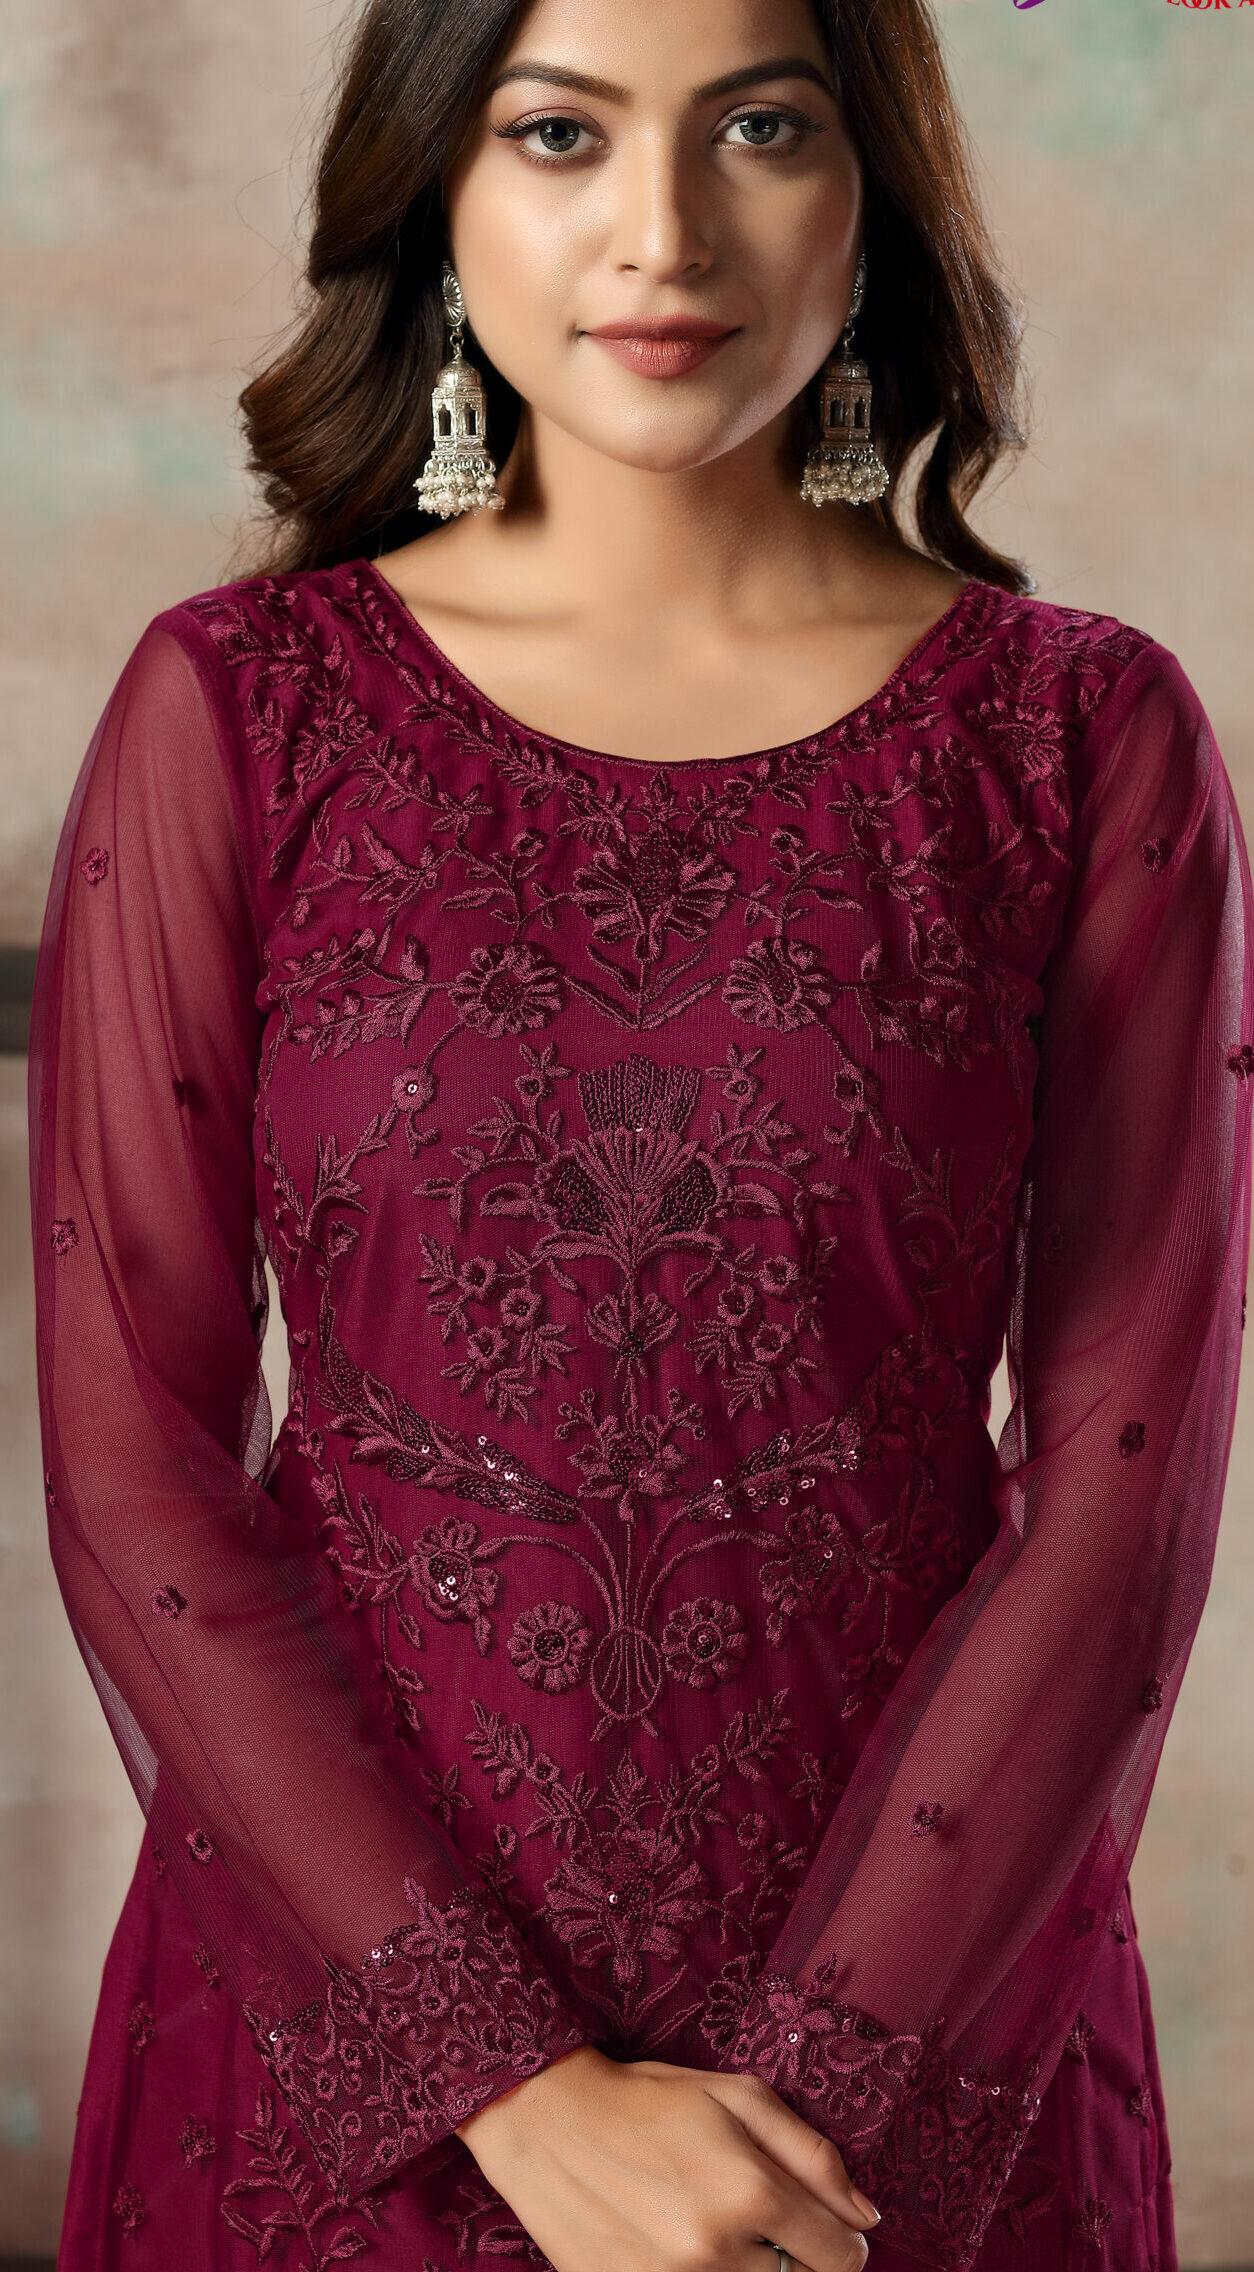 Net Salwar Suit Design with Dupatta in Maroon